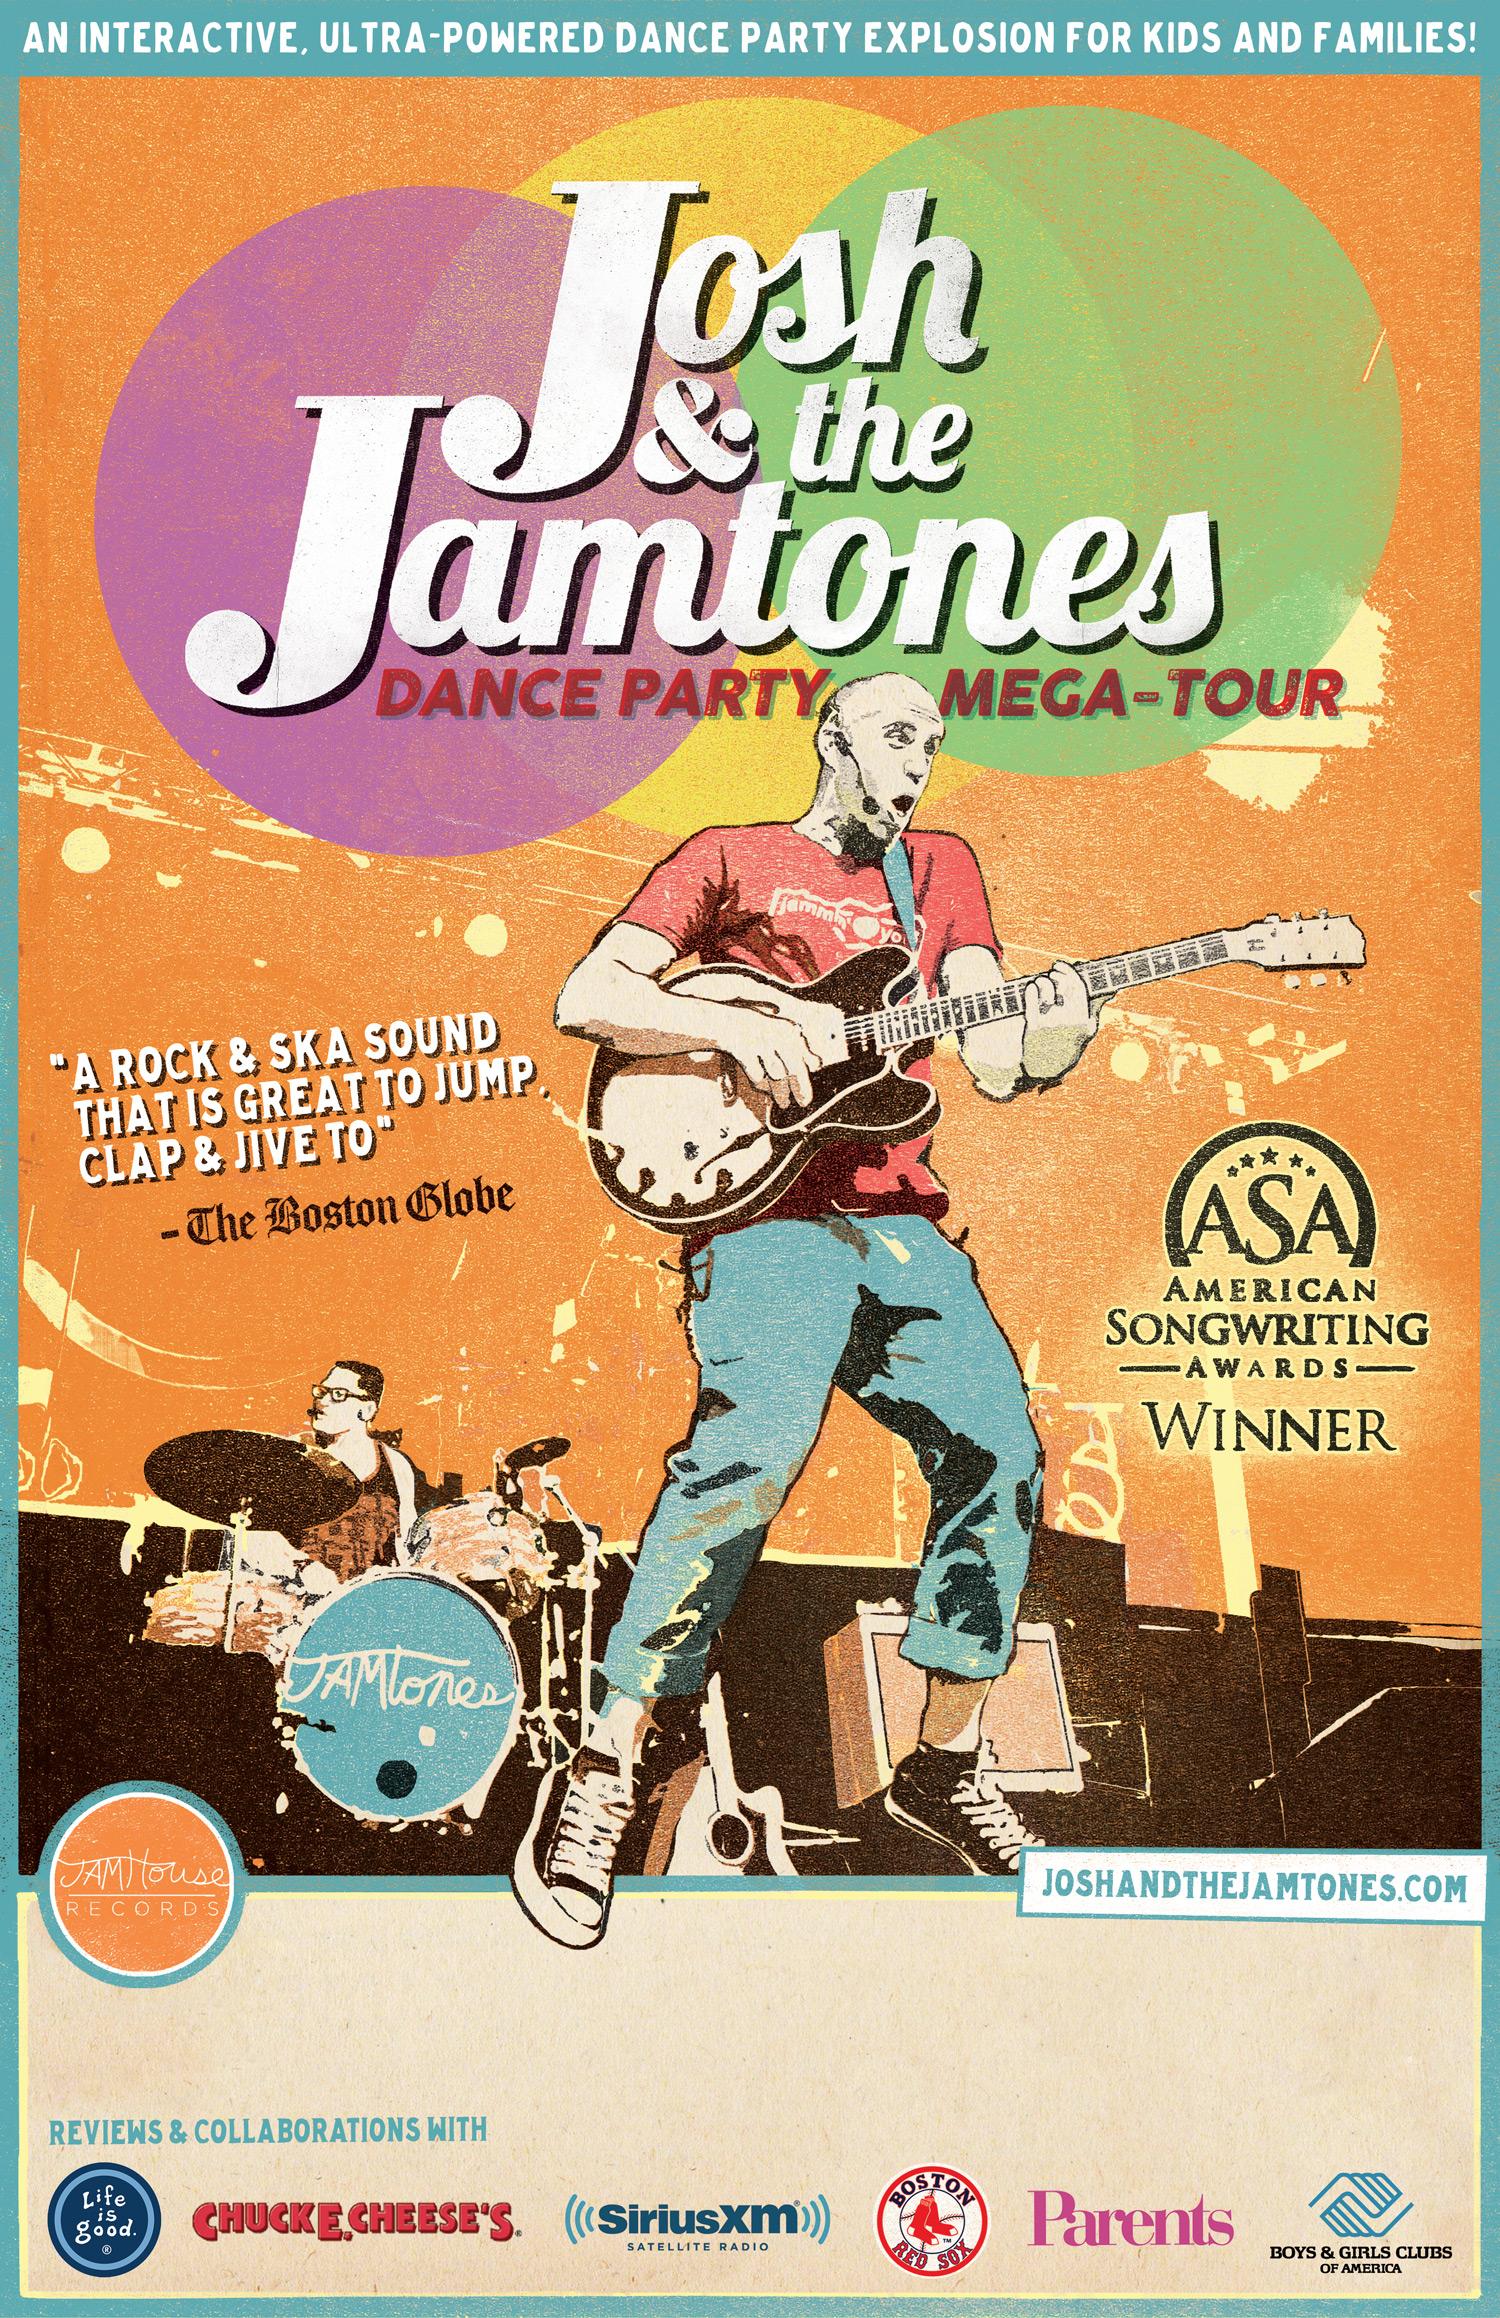 Secular_Jammin_Tour_Poster_WEB.jpg